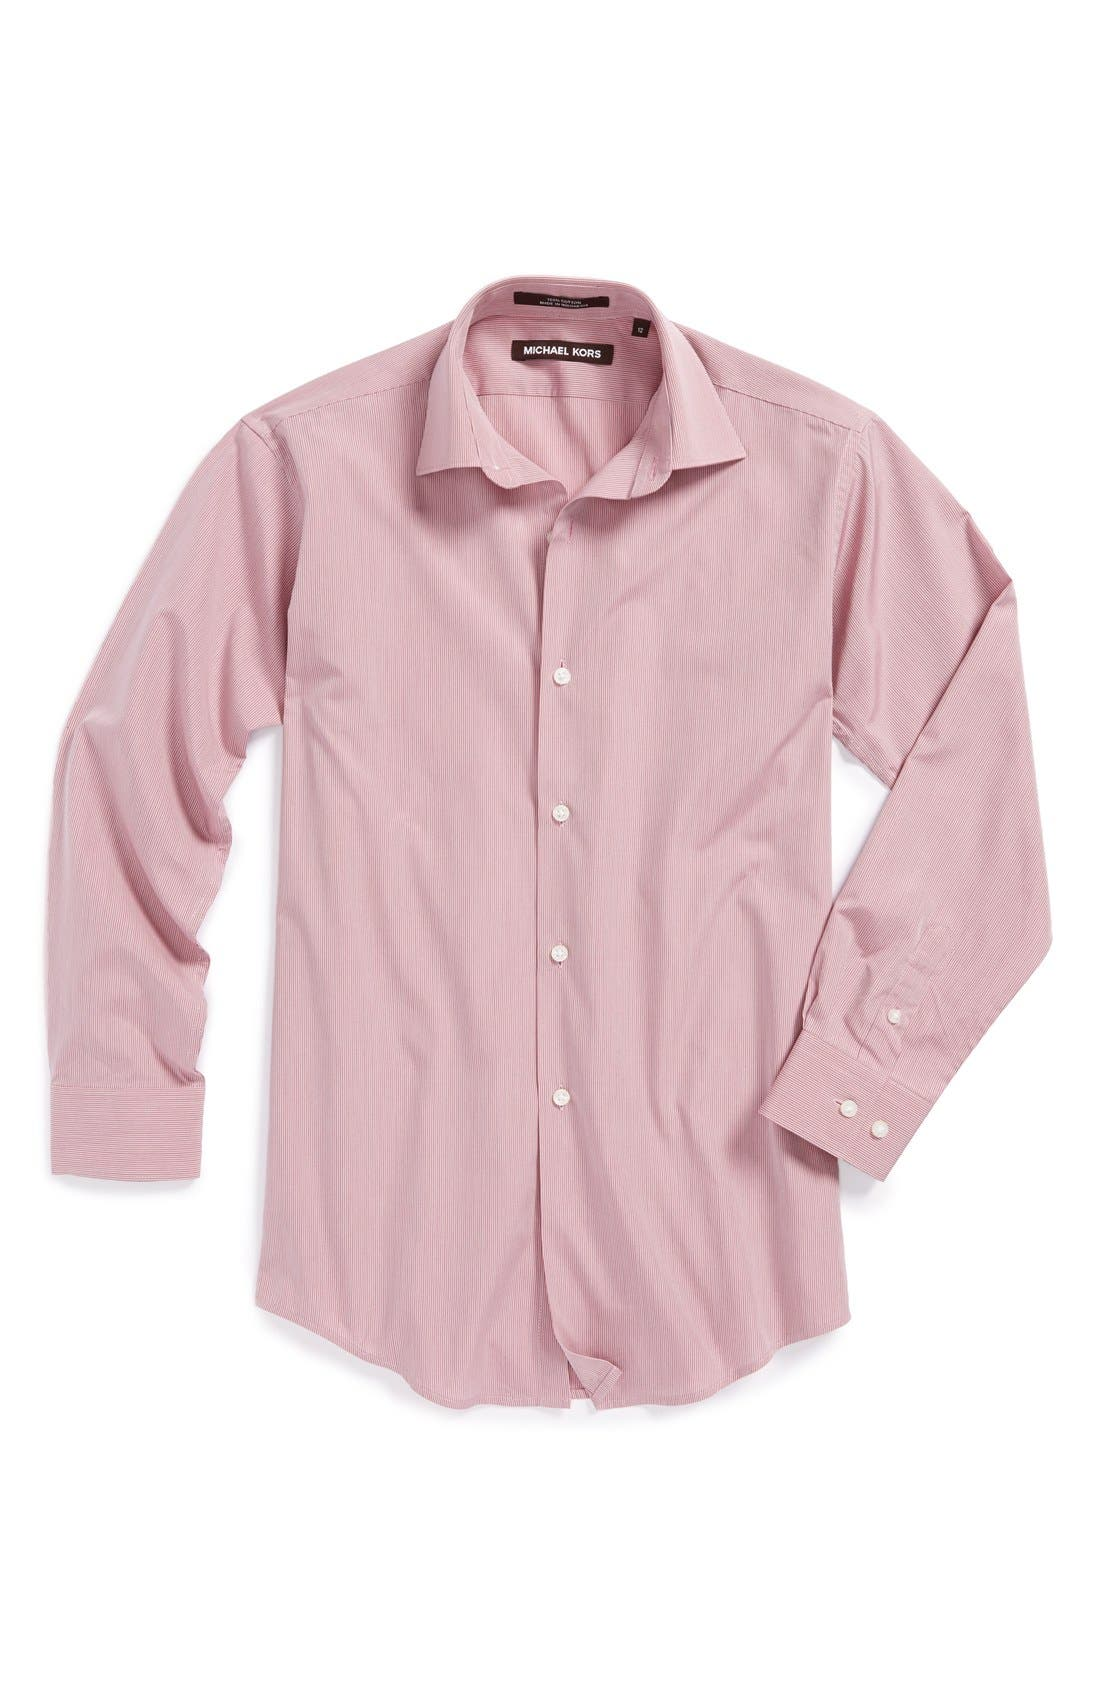 Main Image - Michael Kors Stripe Dress Shirt (Big Boys)